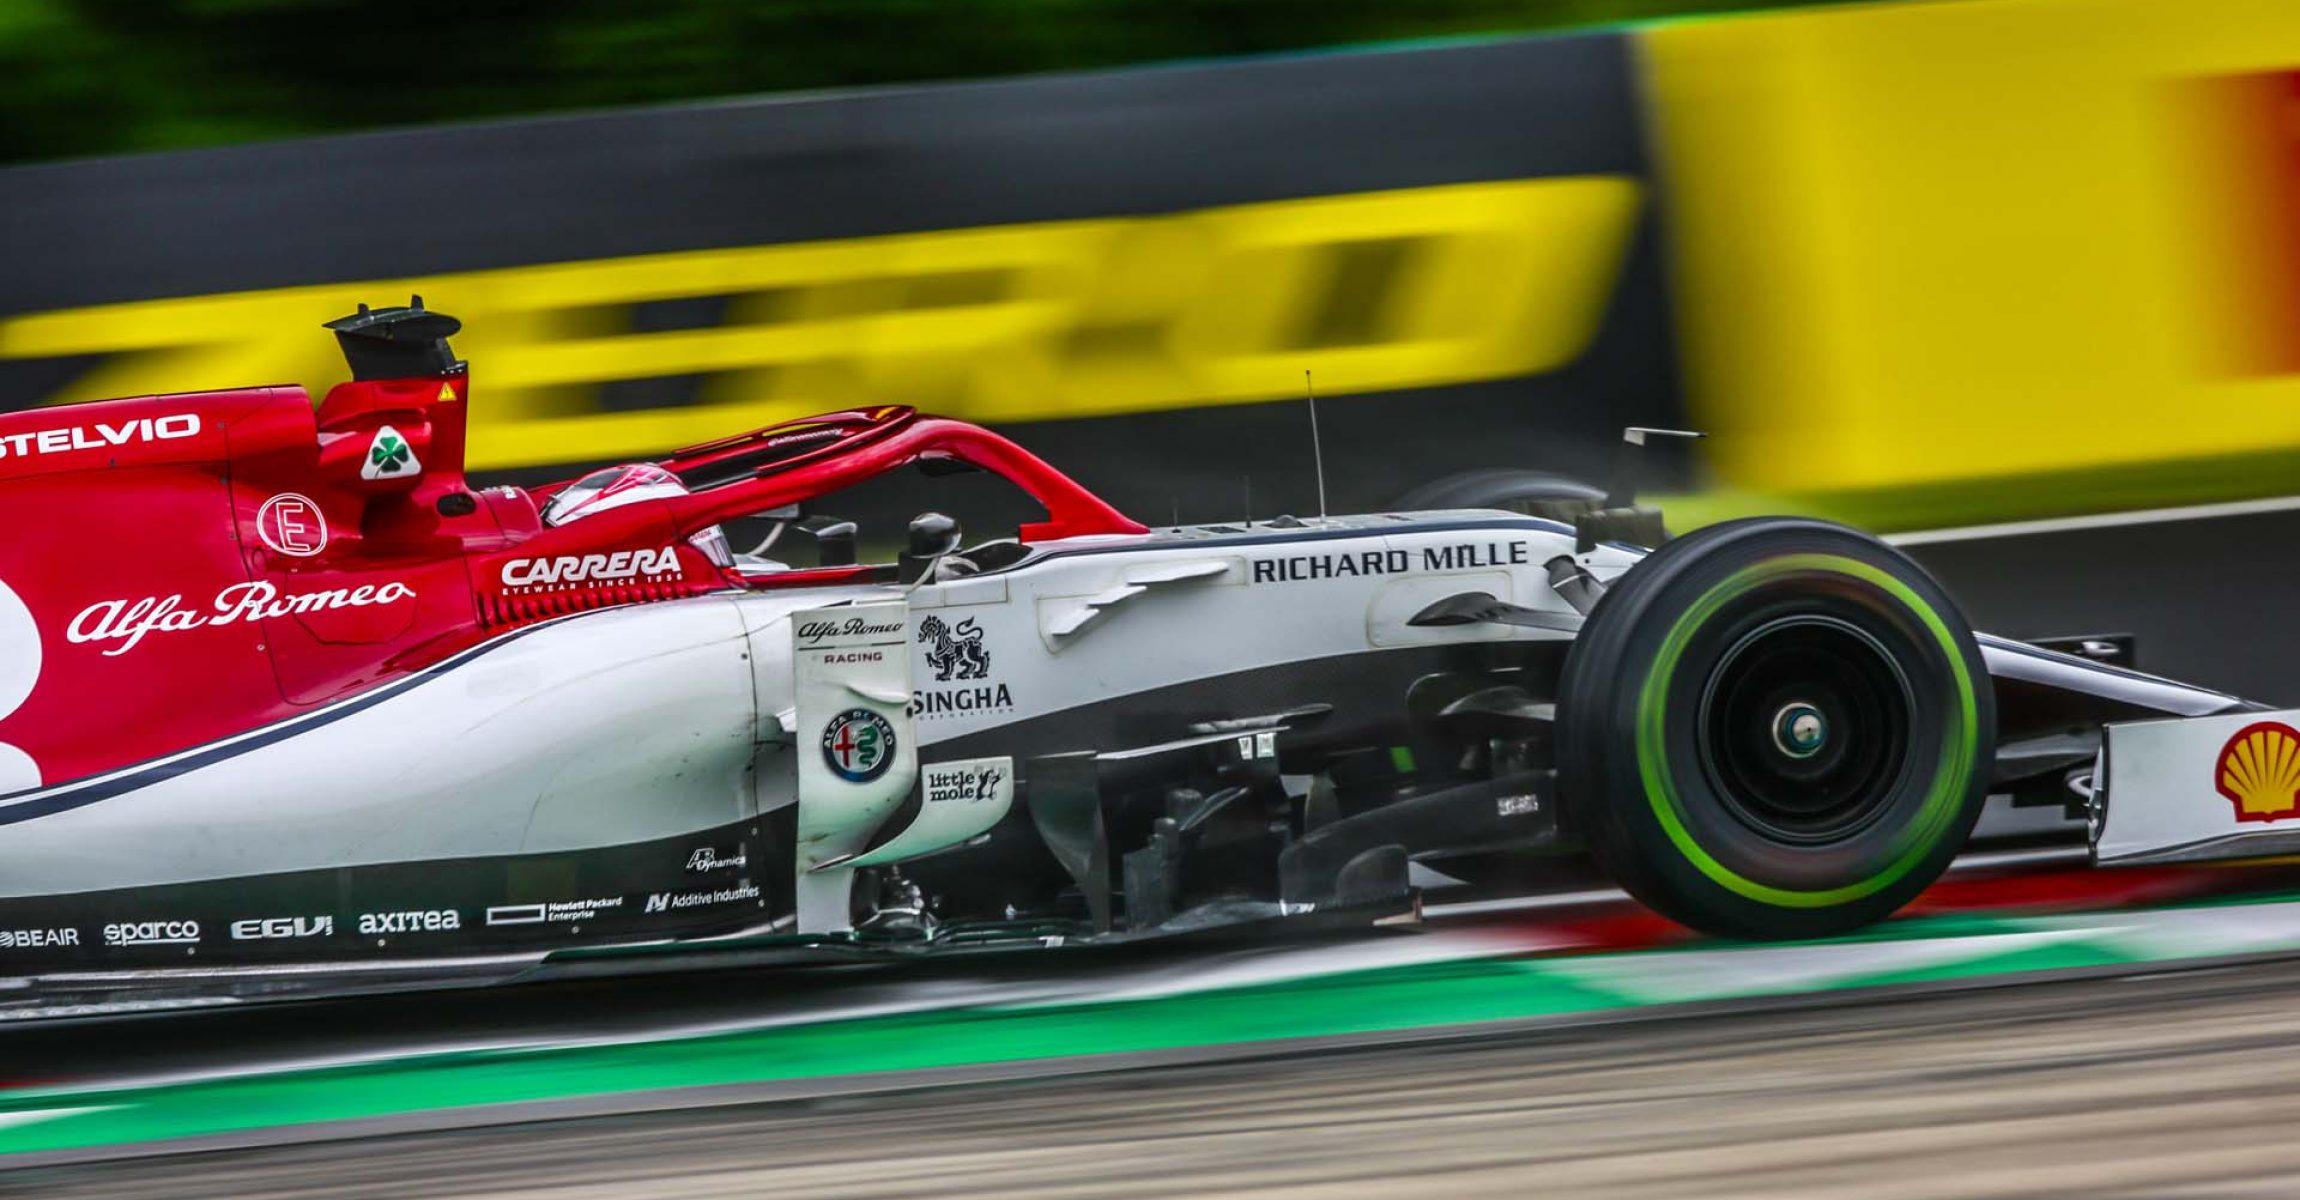 07 RAIKKONEN Kimi Räikkönen (fin), Alfa Romeo Racing C38, action during the 2019 Formula One World Championship, Grand Prix of Hungary from august 1 to 4, Hungaroring, Budapest - Photo Xavi Bonilla / DPPI